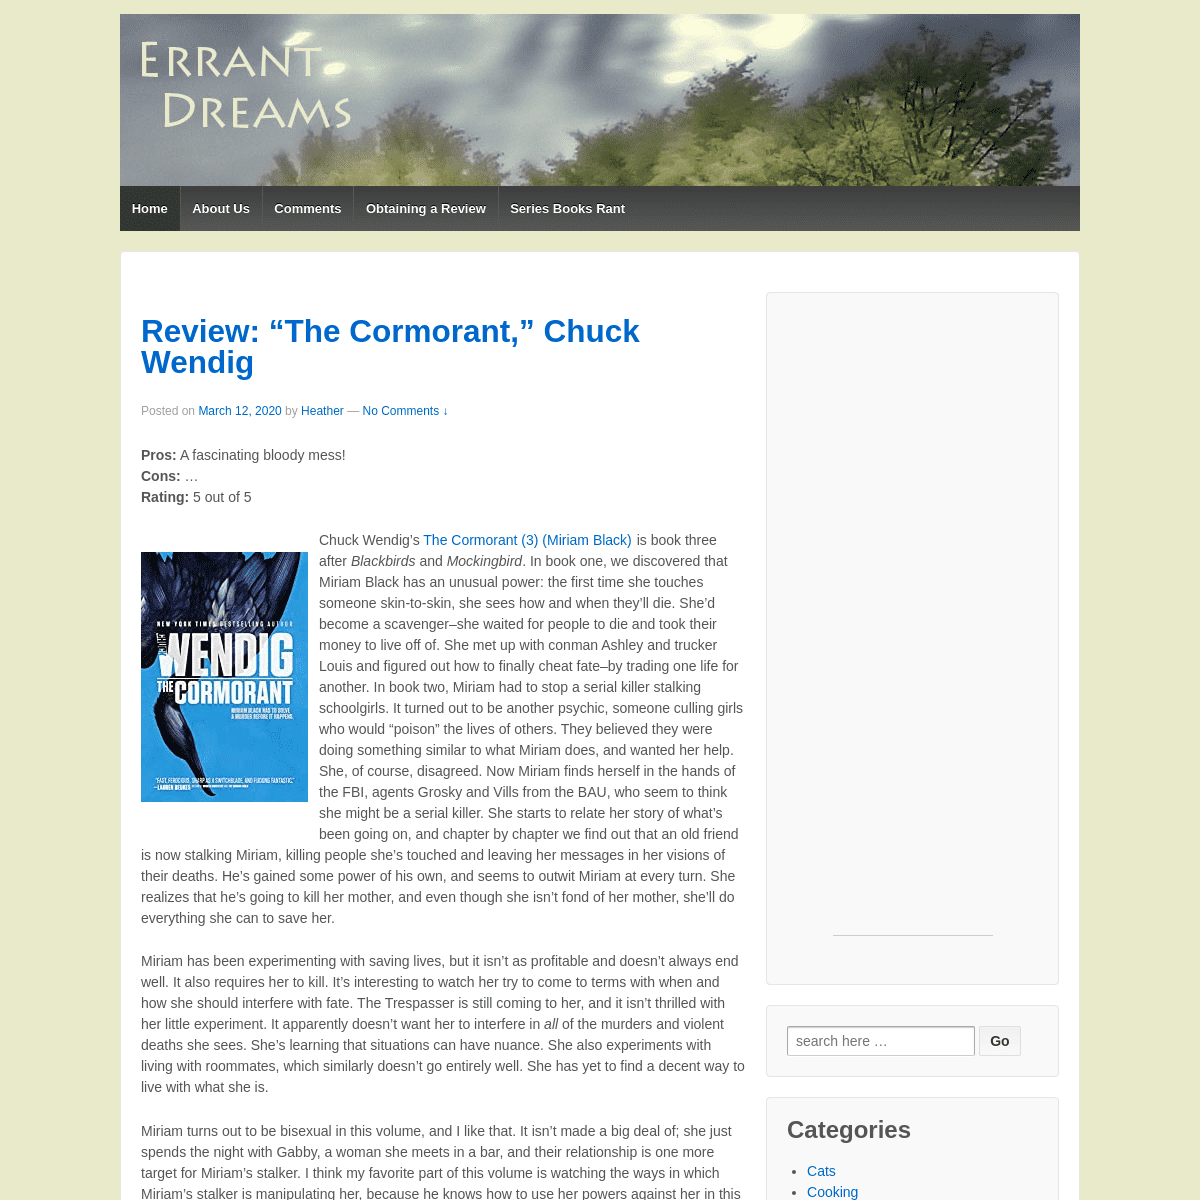 Errant Dreams – Book reviews of all kinds!